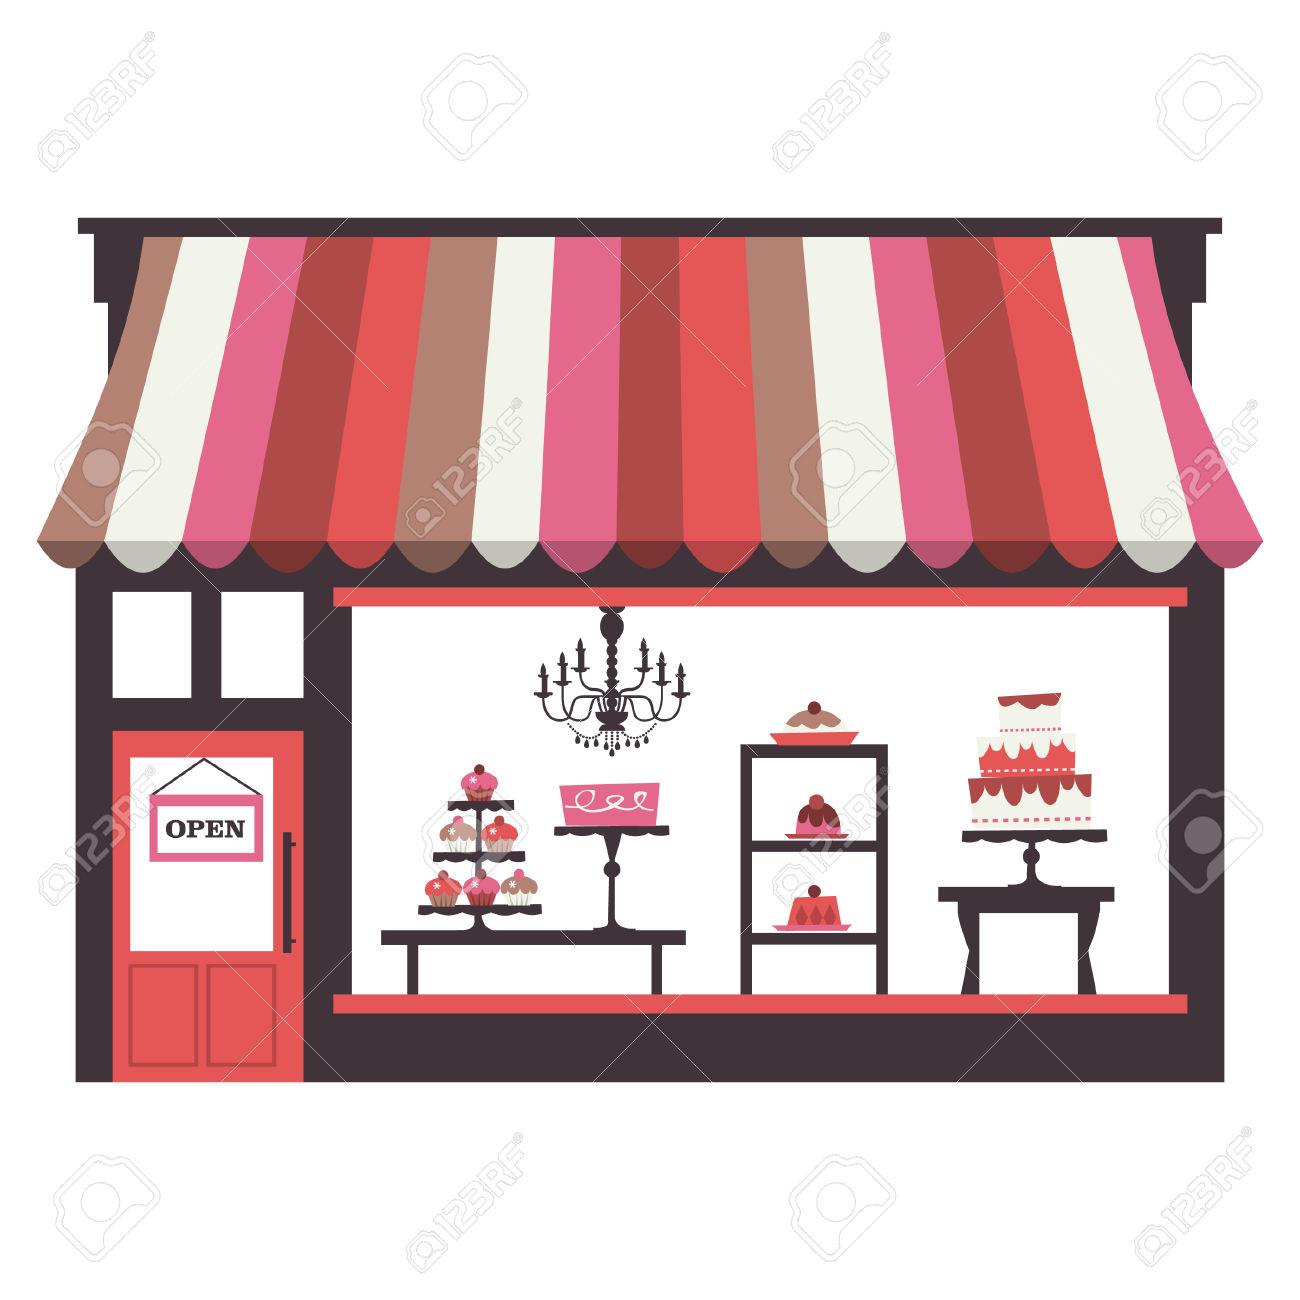 892 Shopfront Cliparts, Stock Vector And Royalty Free Shopfront.